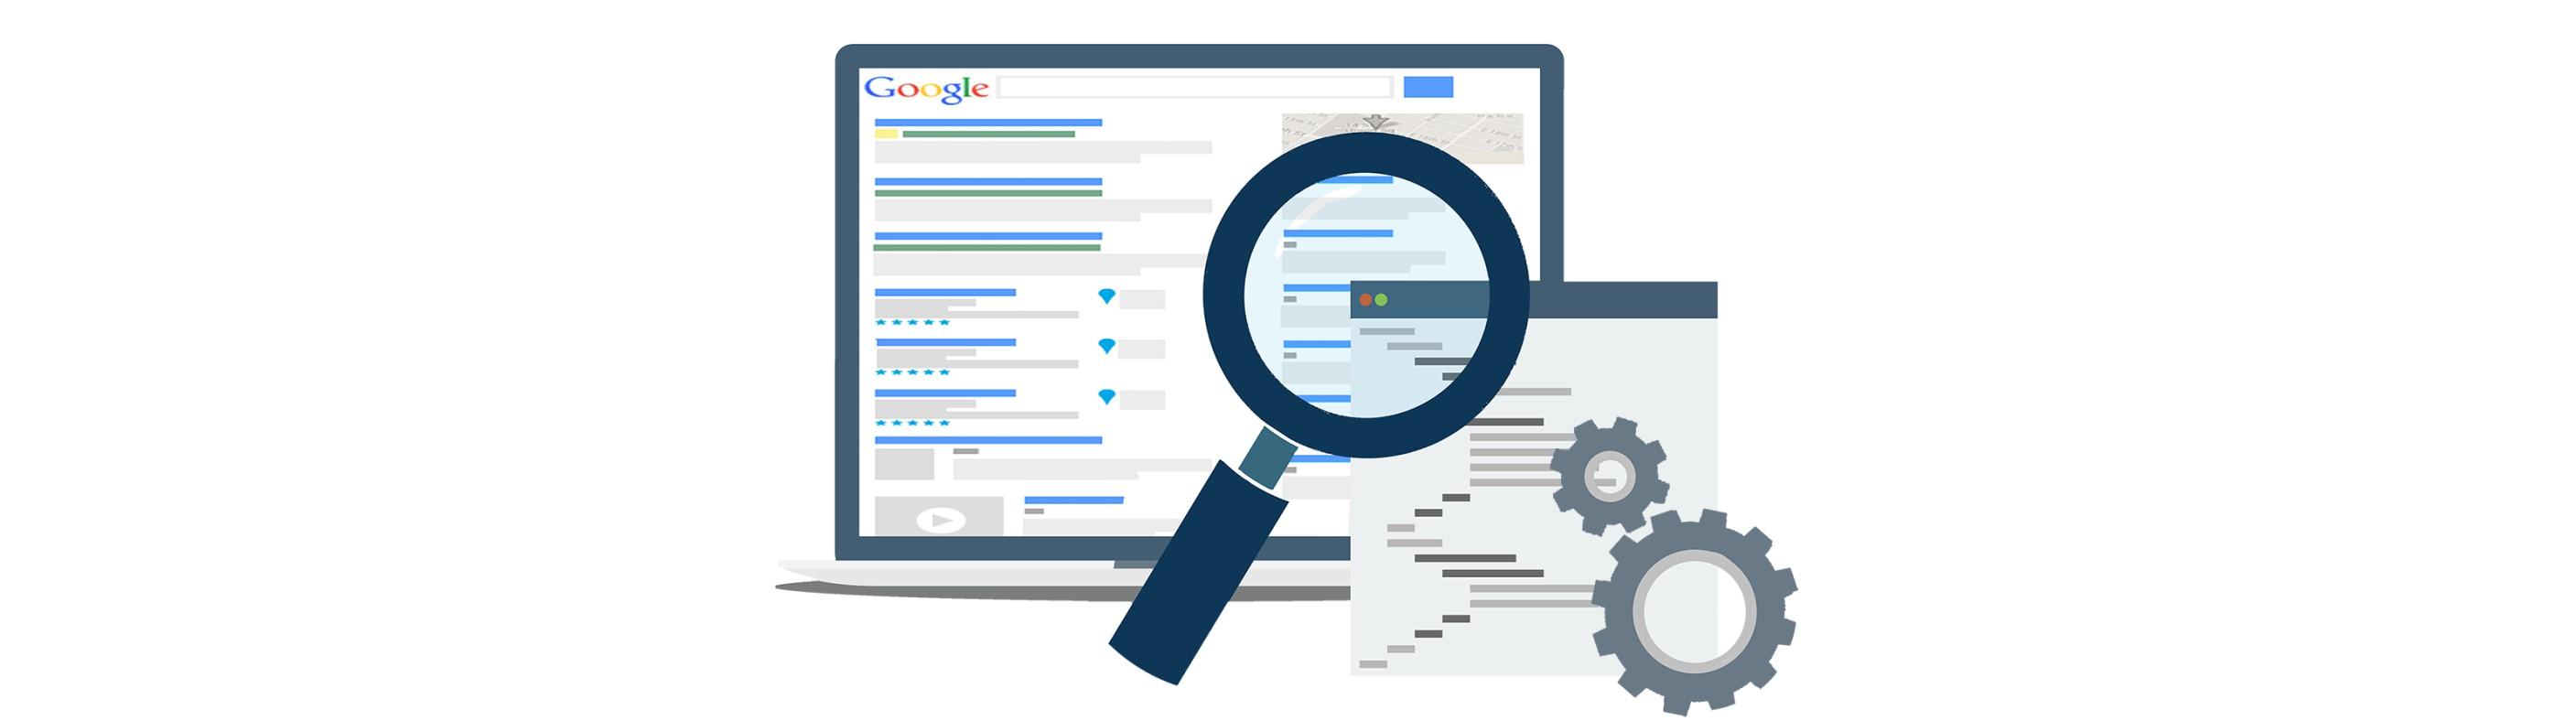 LimoneWeb.it - Primi su Google